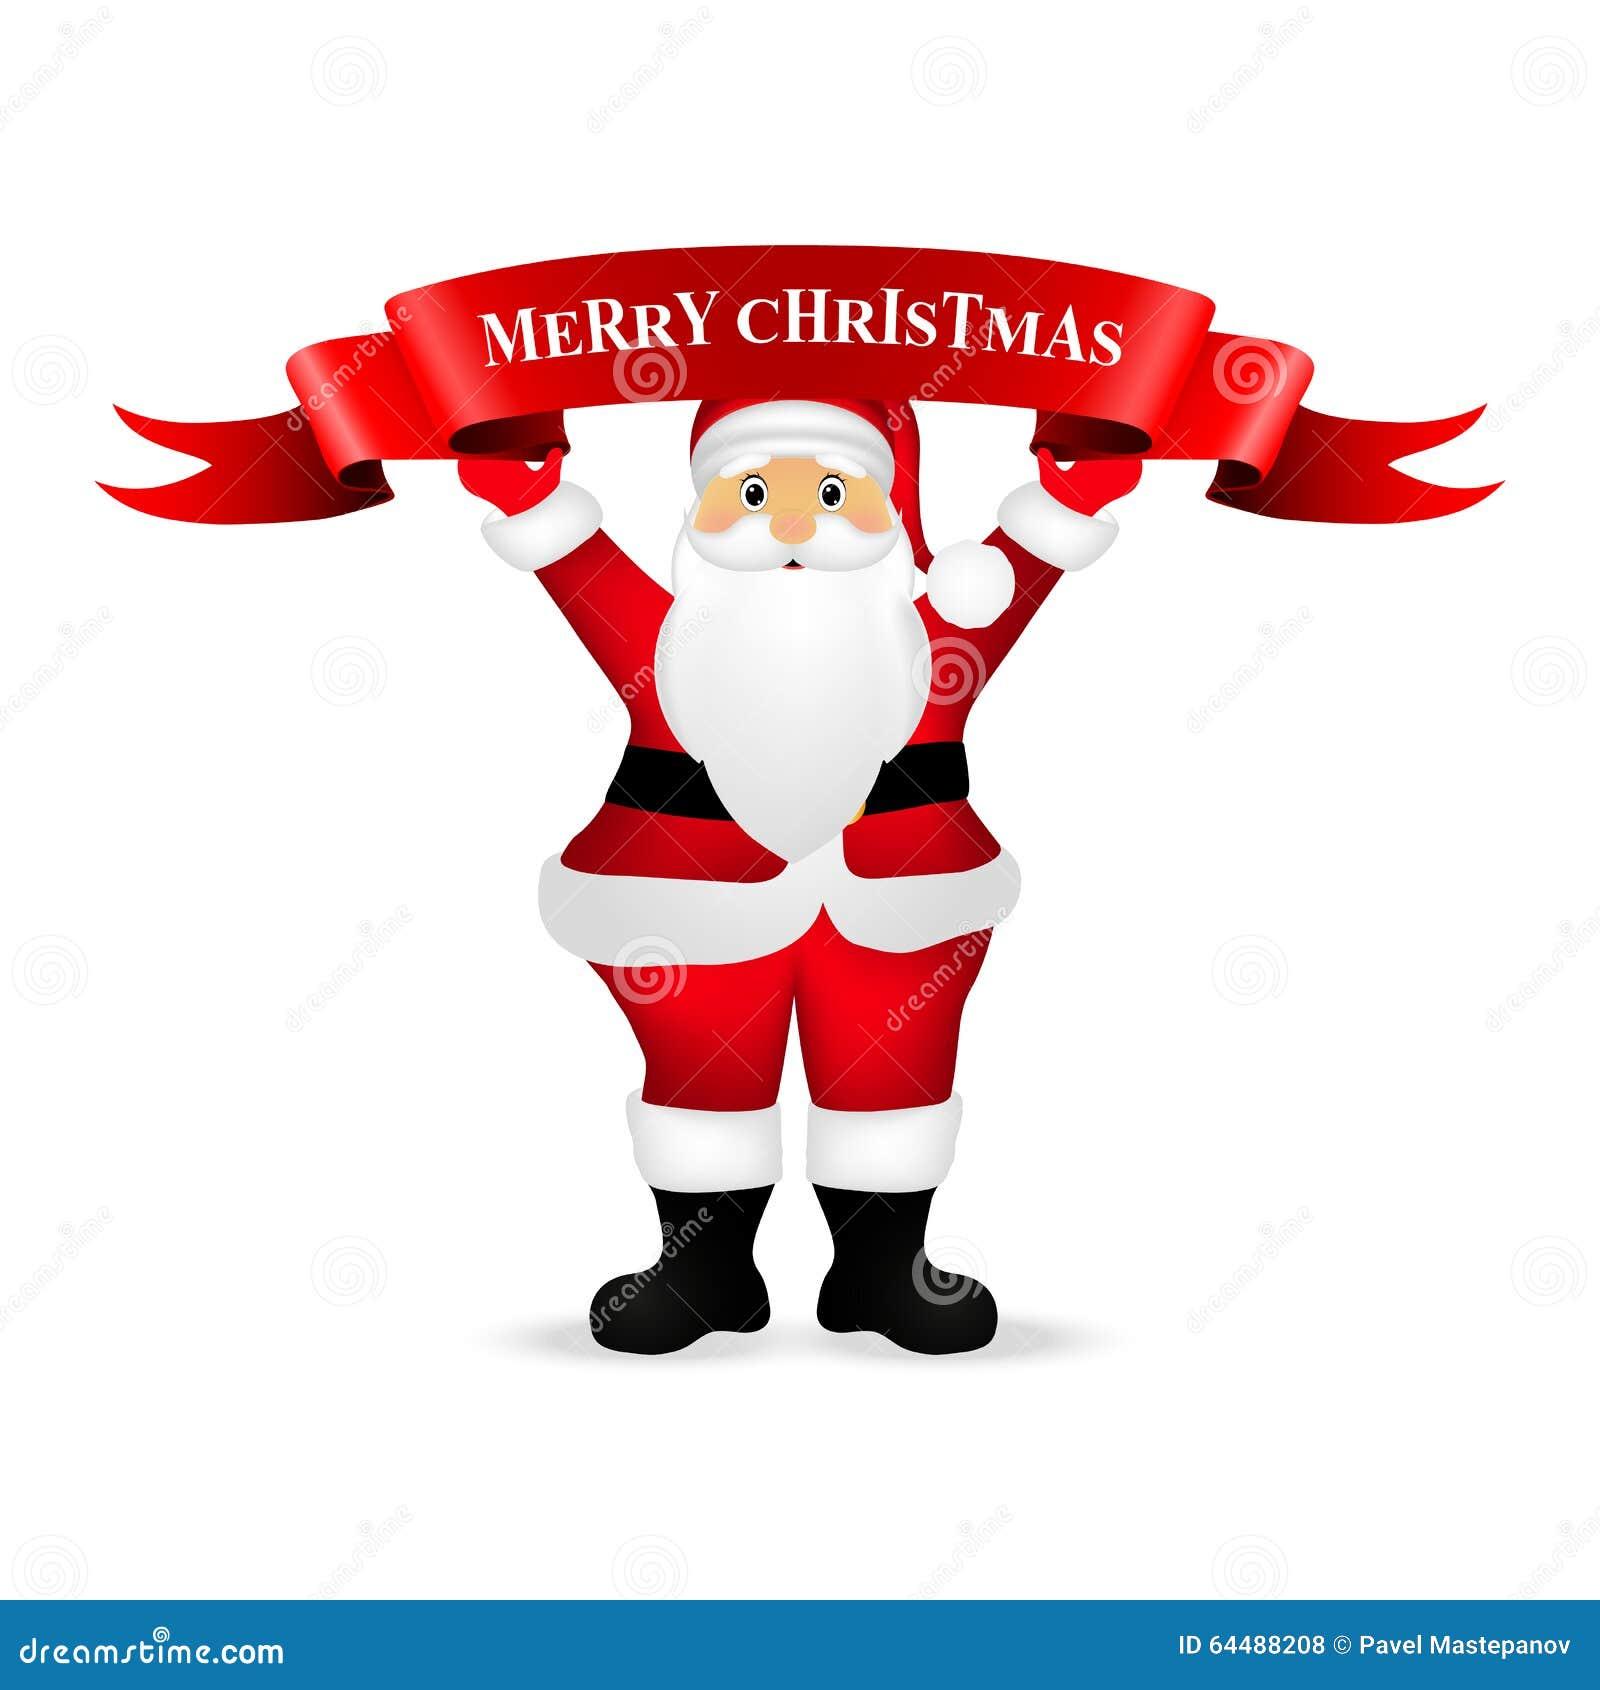 Christmas Clipart Santa.Santa Claus Wishes Everyone A Merry Christmas Stock